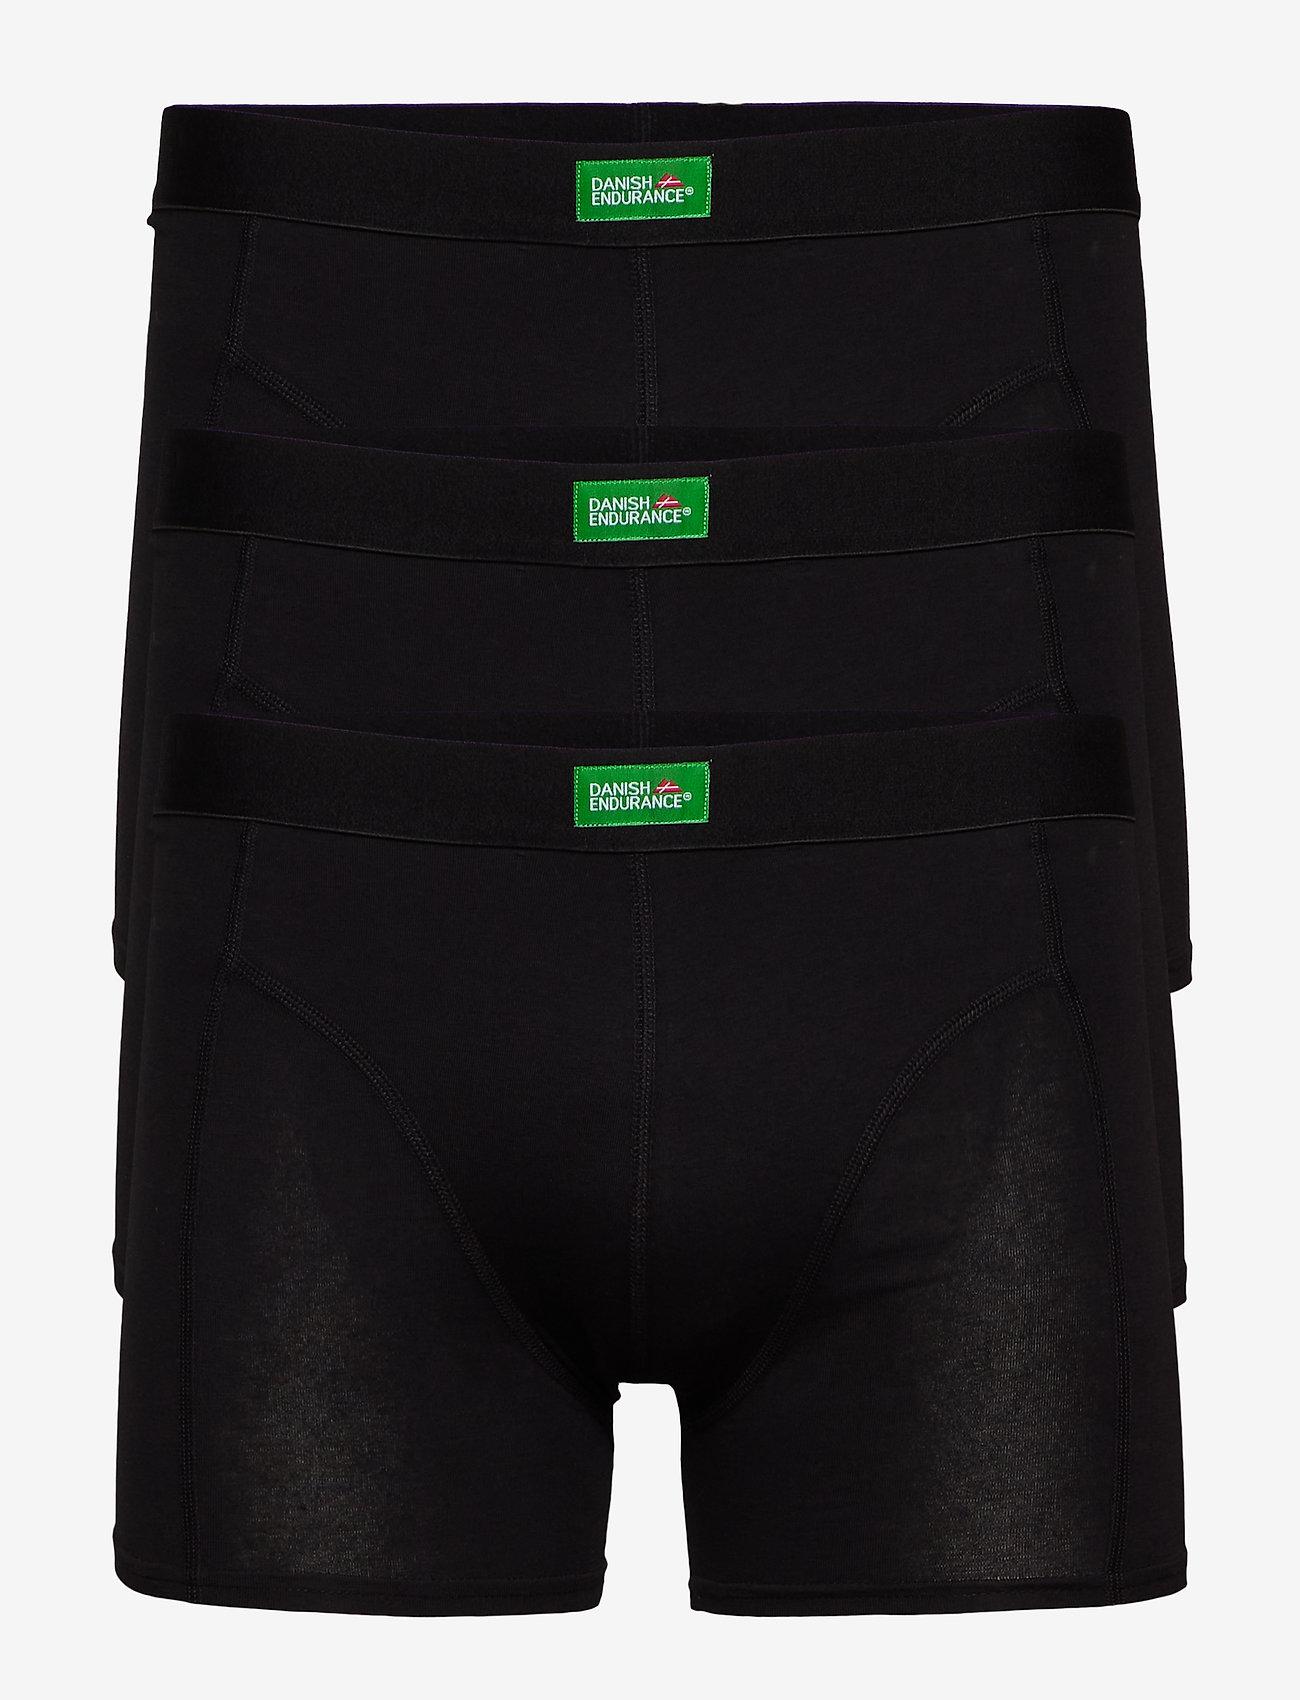 Danish Endurance - Organic Cotton Trunks 3 Pack - nieuwe mode - black - 0